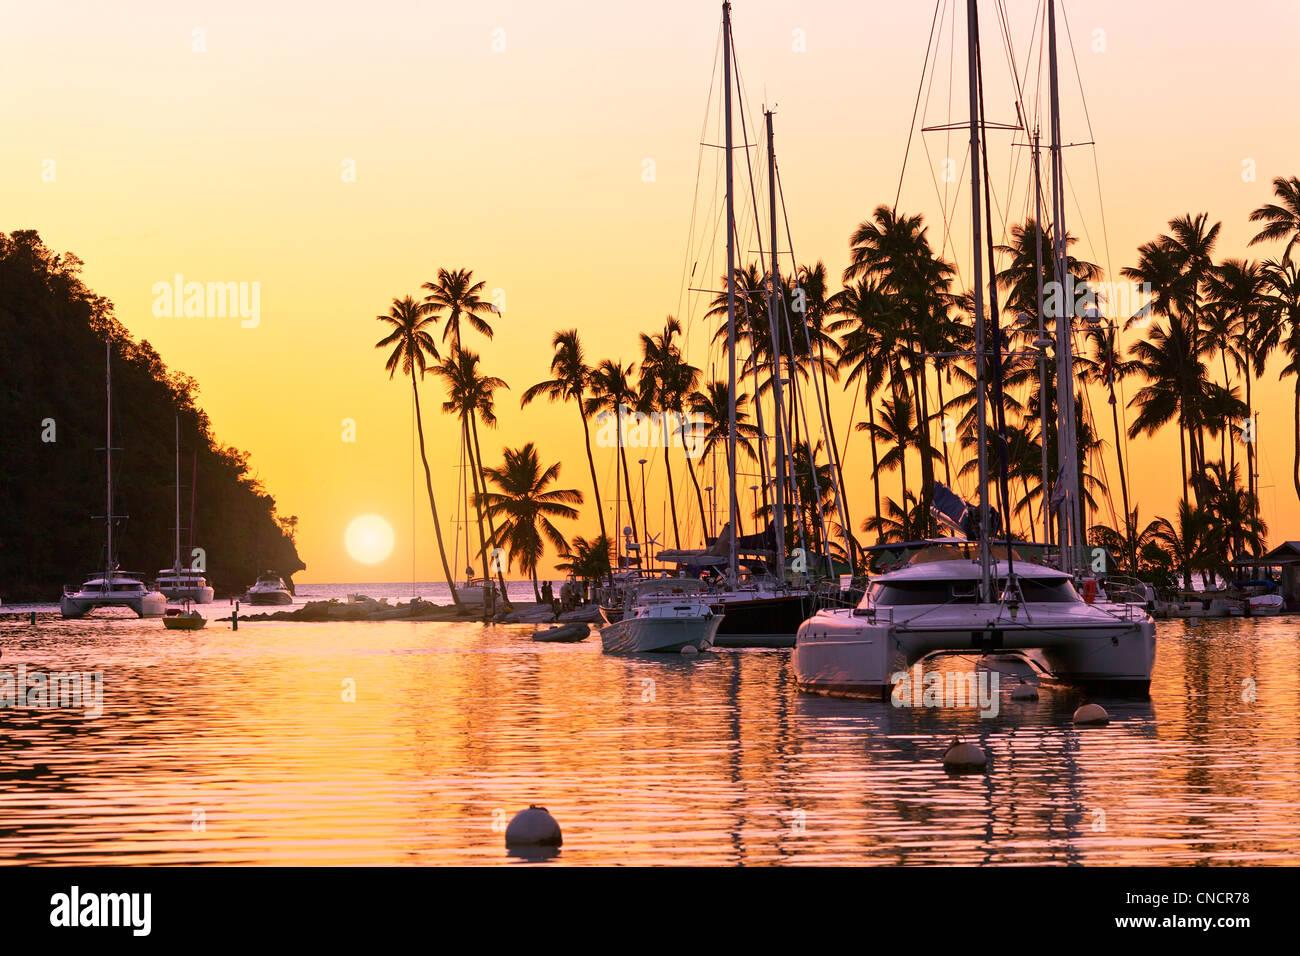 St. Lucia, Marigot Bay at Sunset - Stock Image